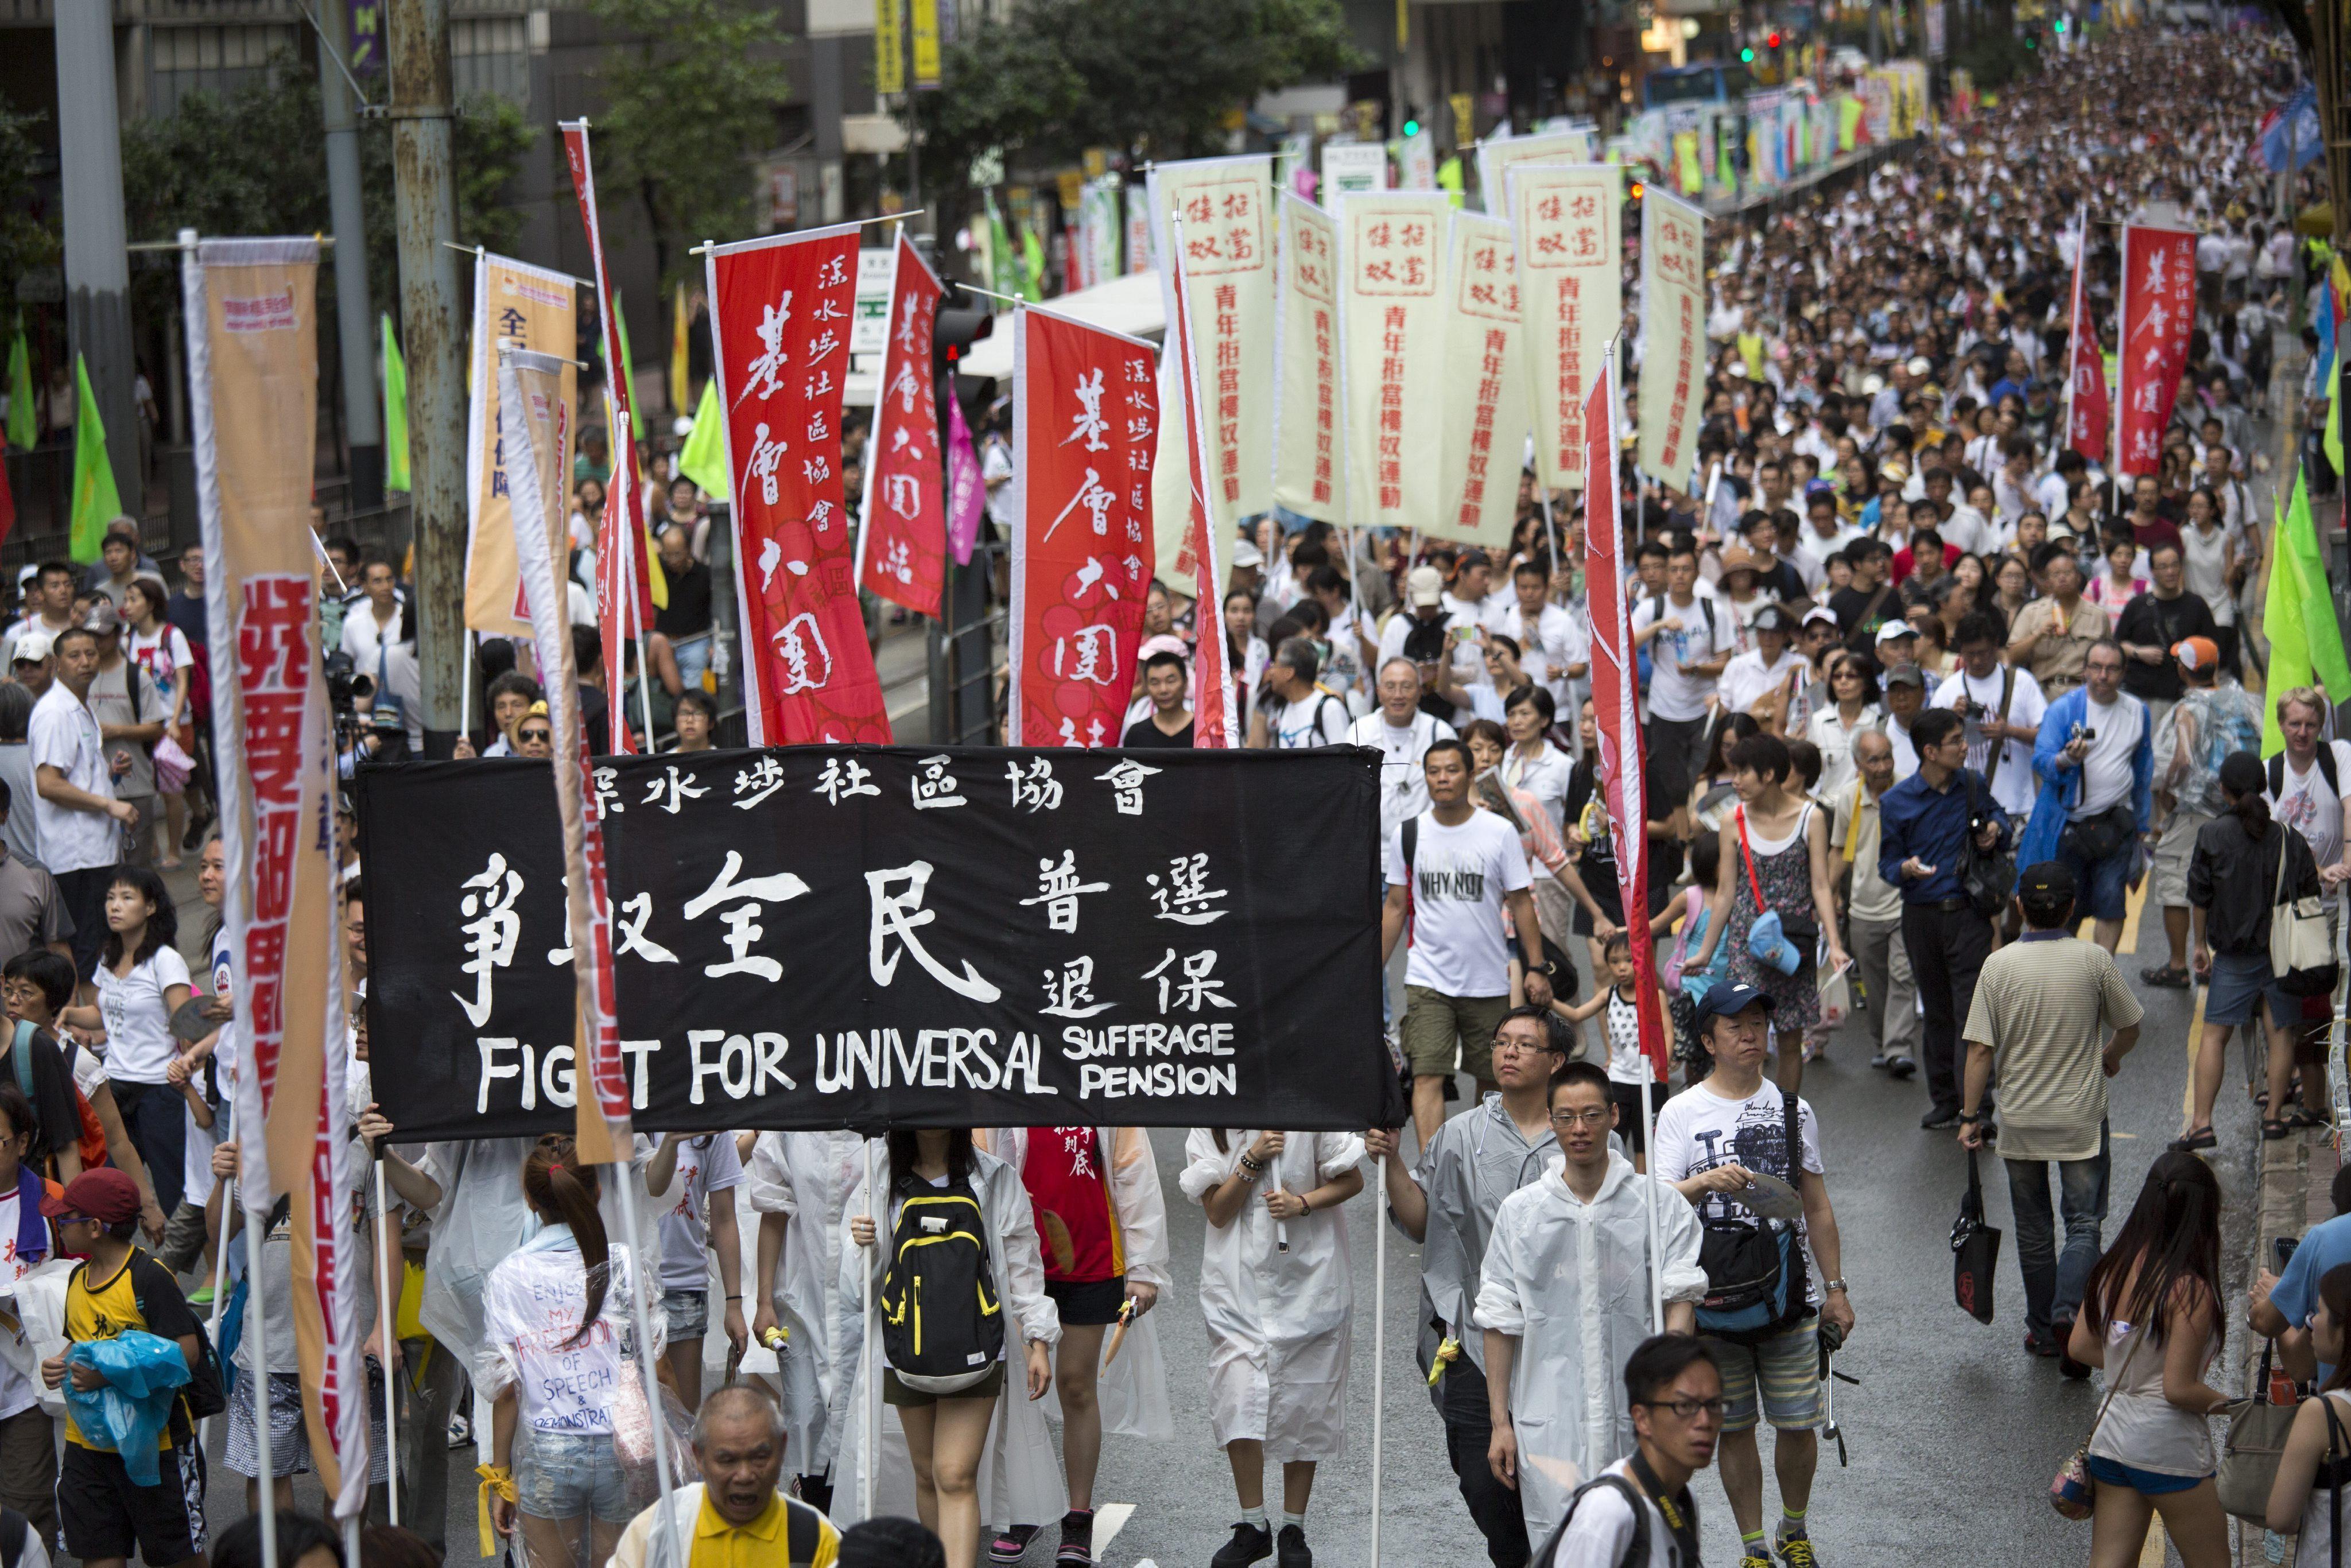 Multitudinaria manifestación para pedir el sufragio universal en Hong Kong